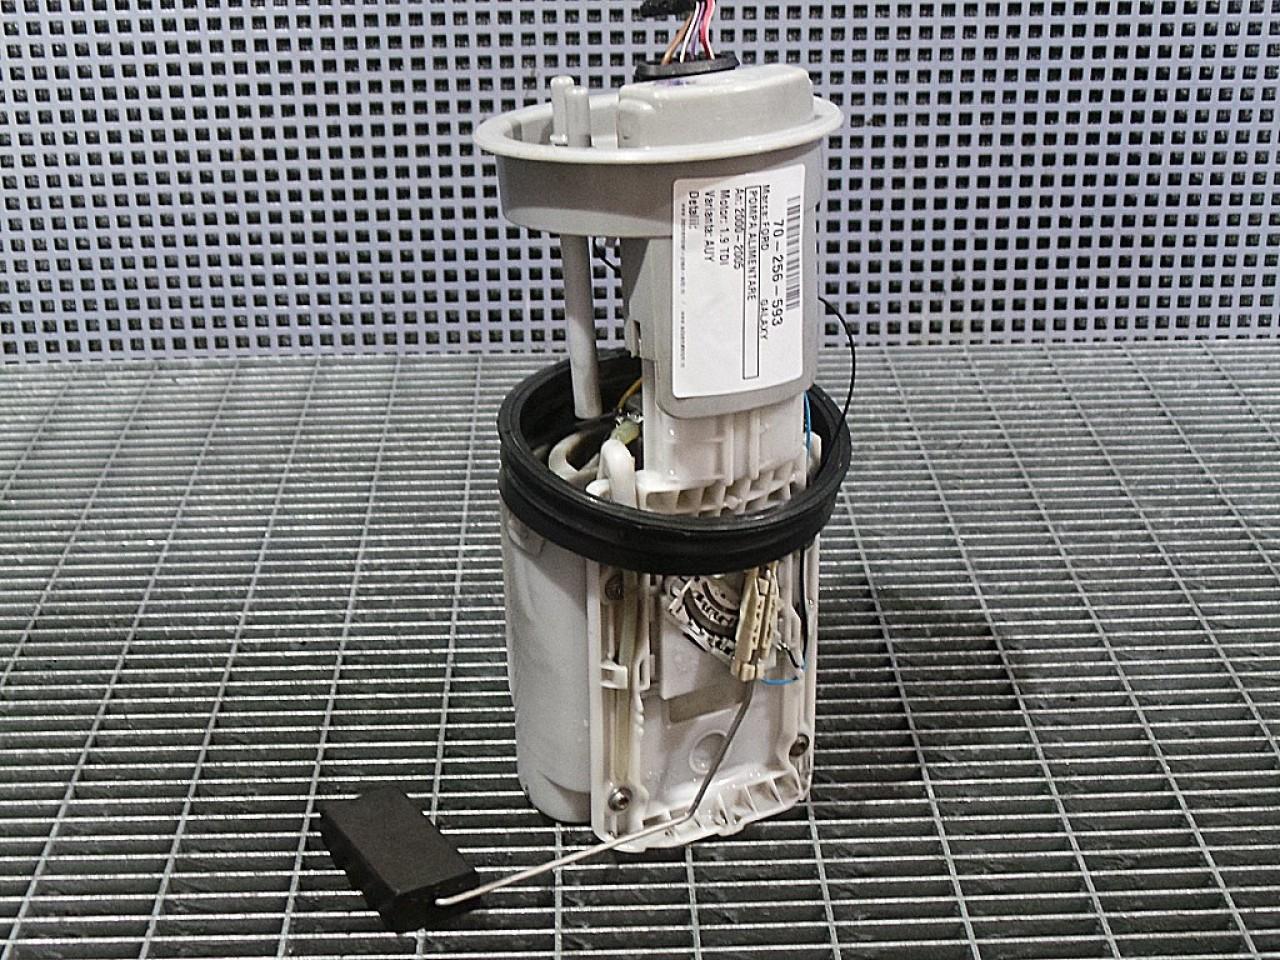 POMPA ALIMENTARE FORD GALAXY (WGR) 2.0 i benzina (1995 - 03-2006-05)